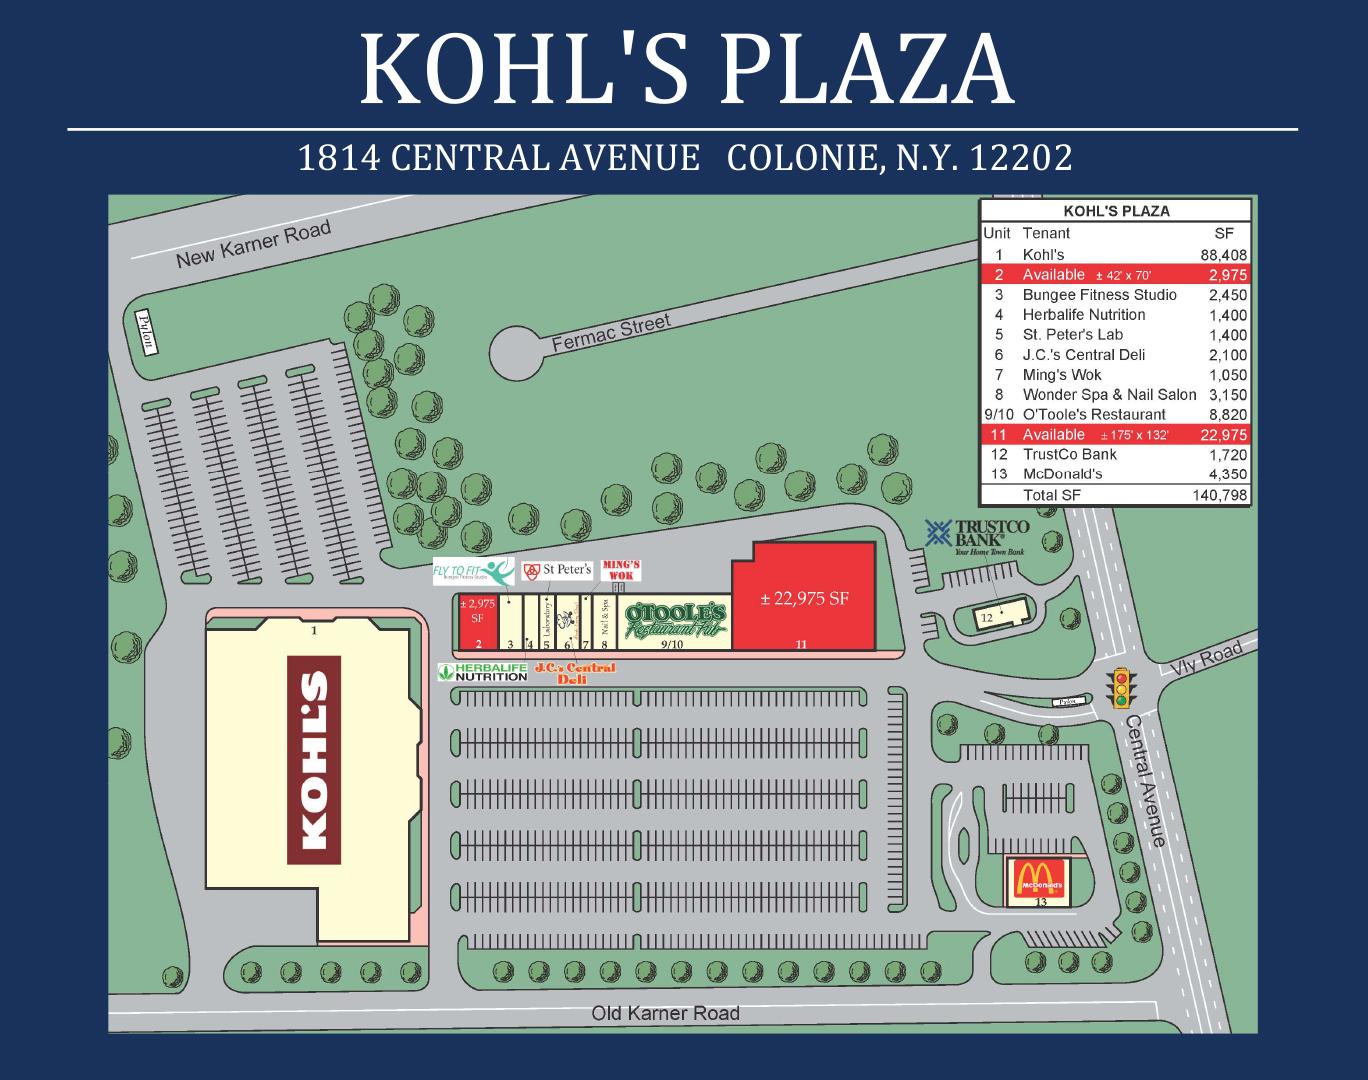 Kohl's Plaza